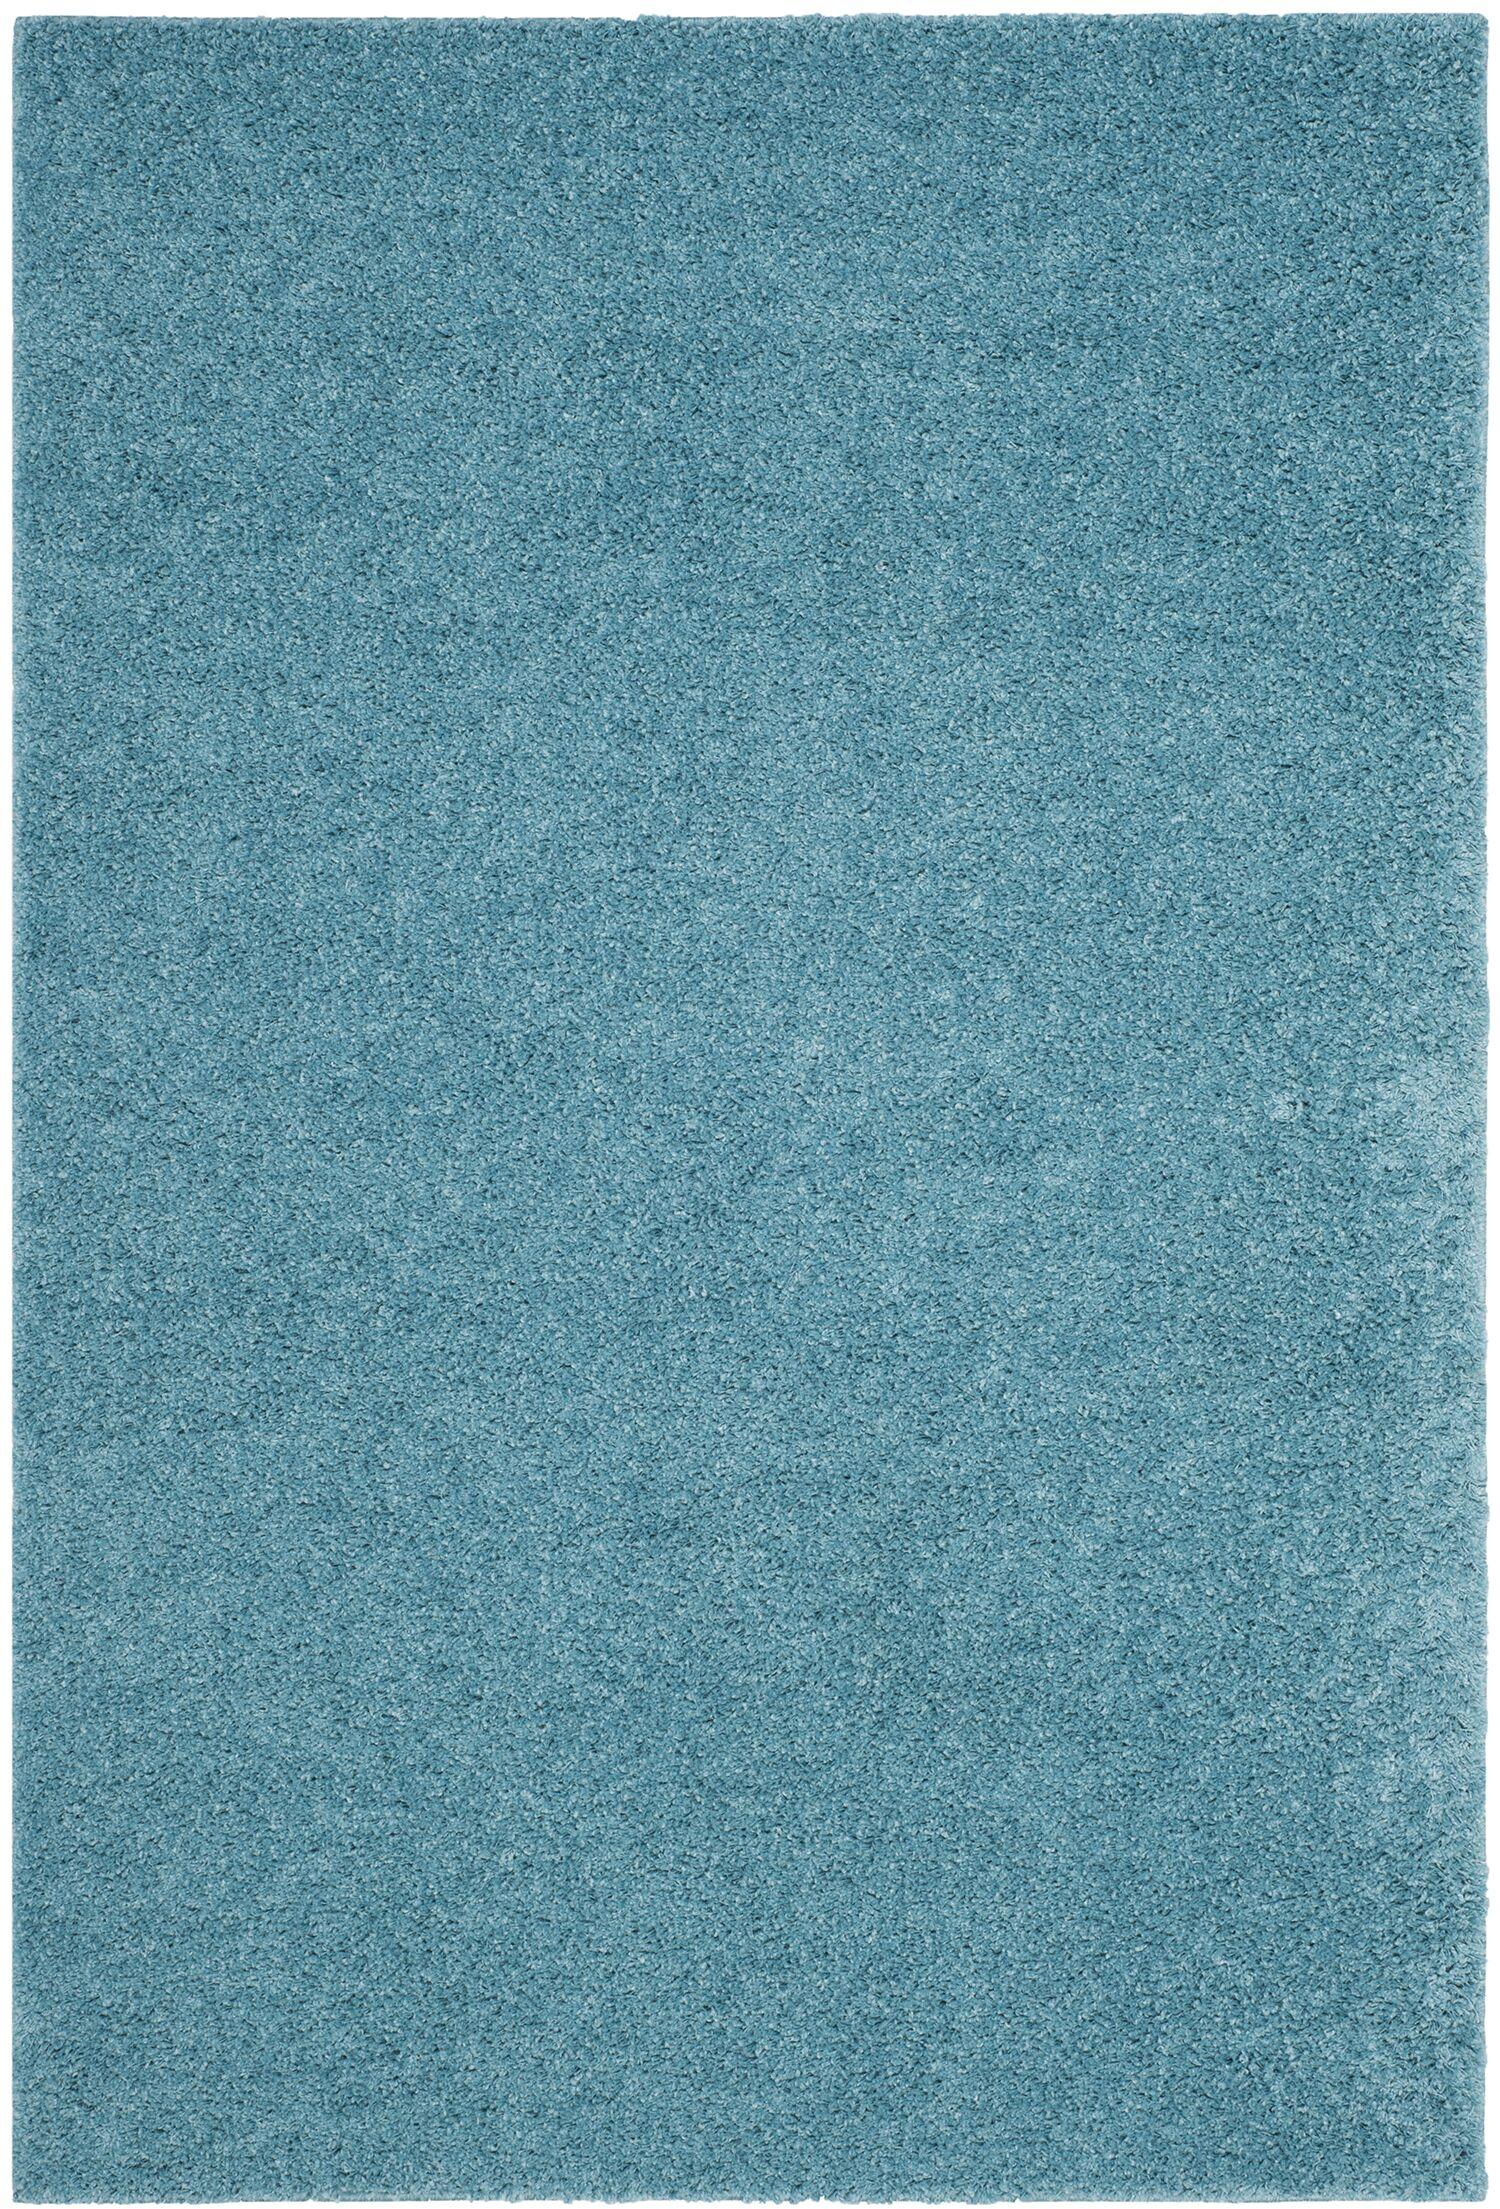 Curran Aqua Area Rug Rug Size: Square 6'7